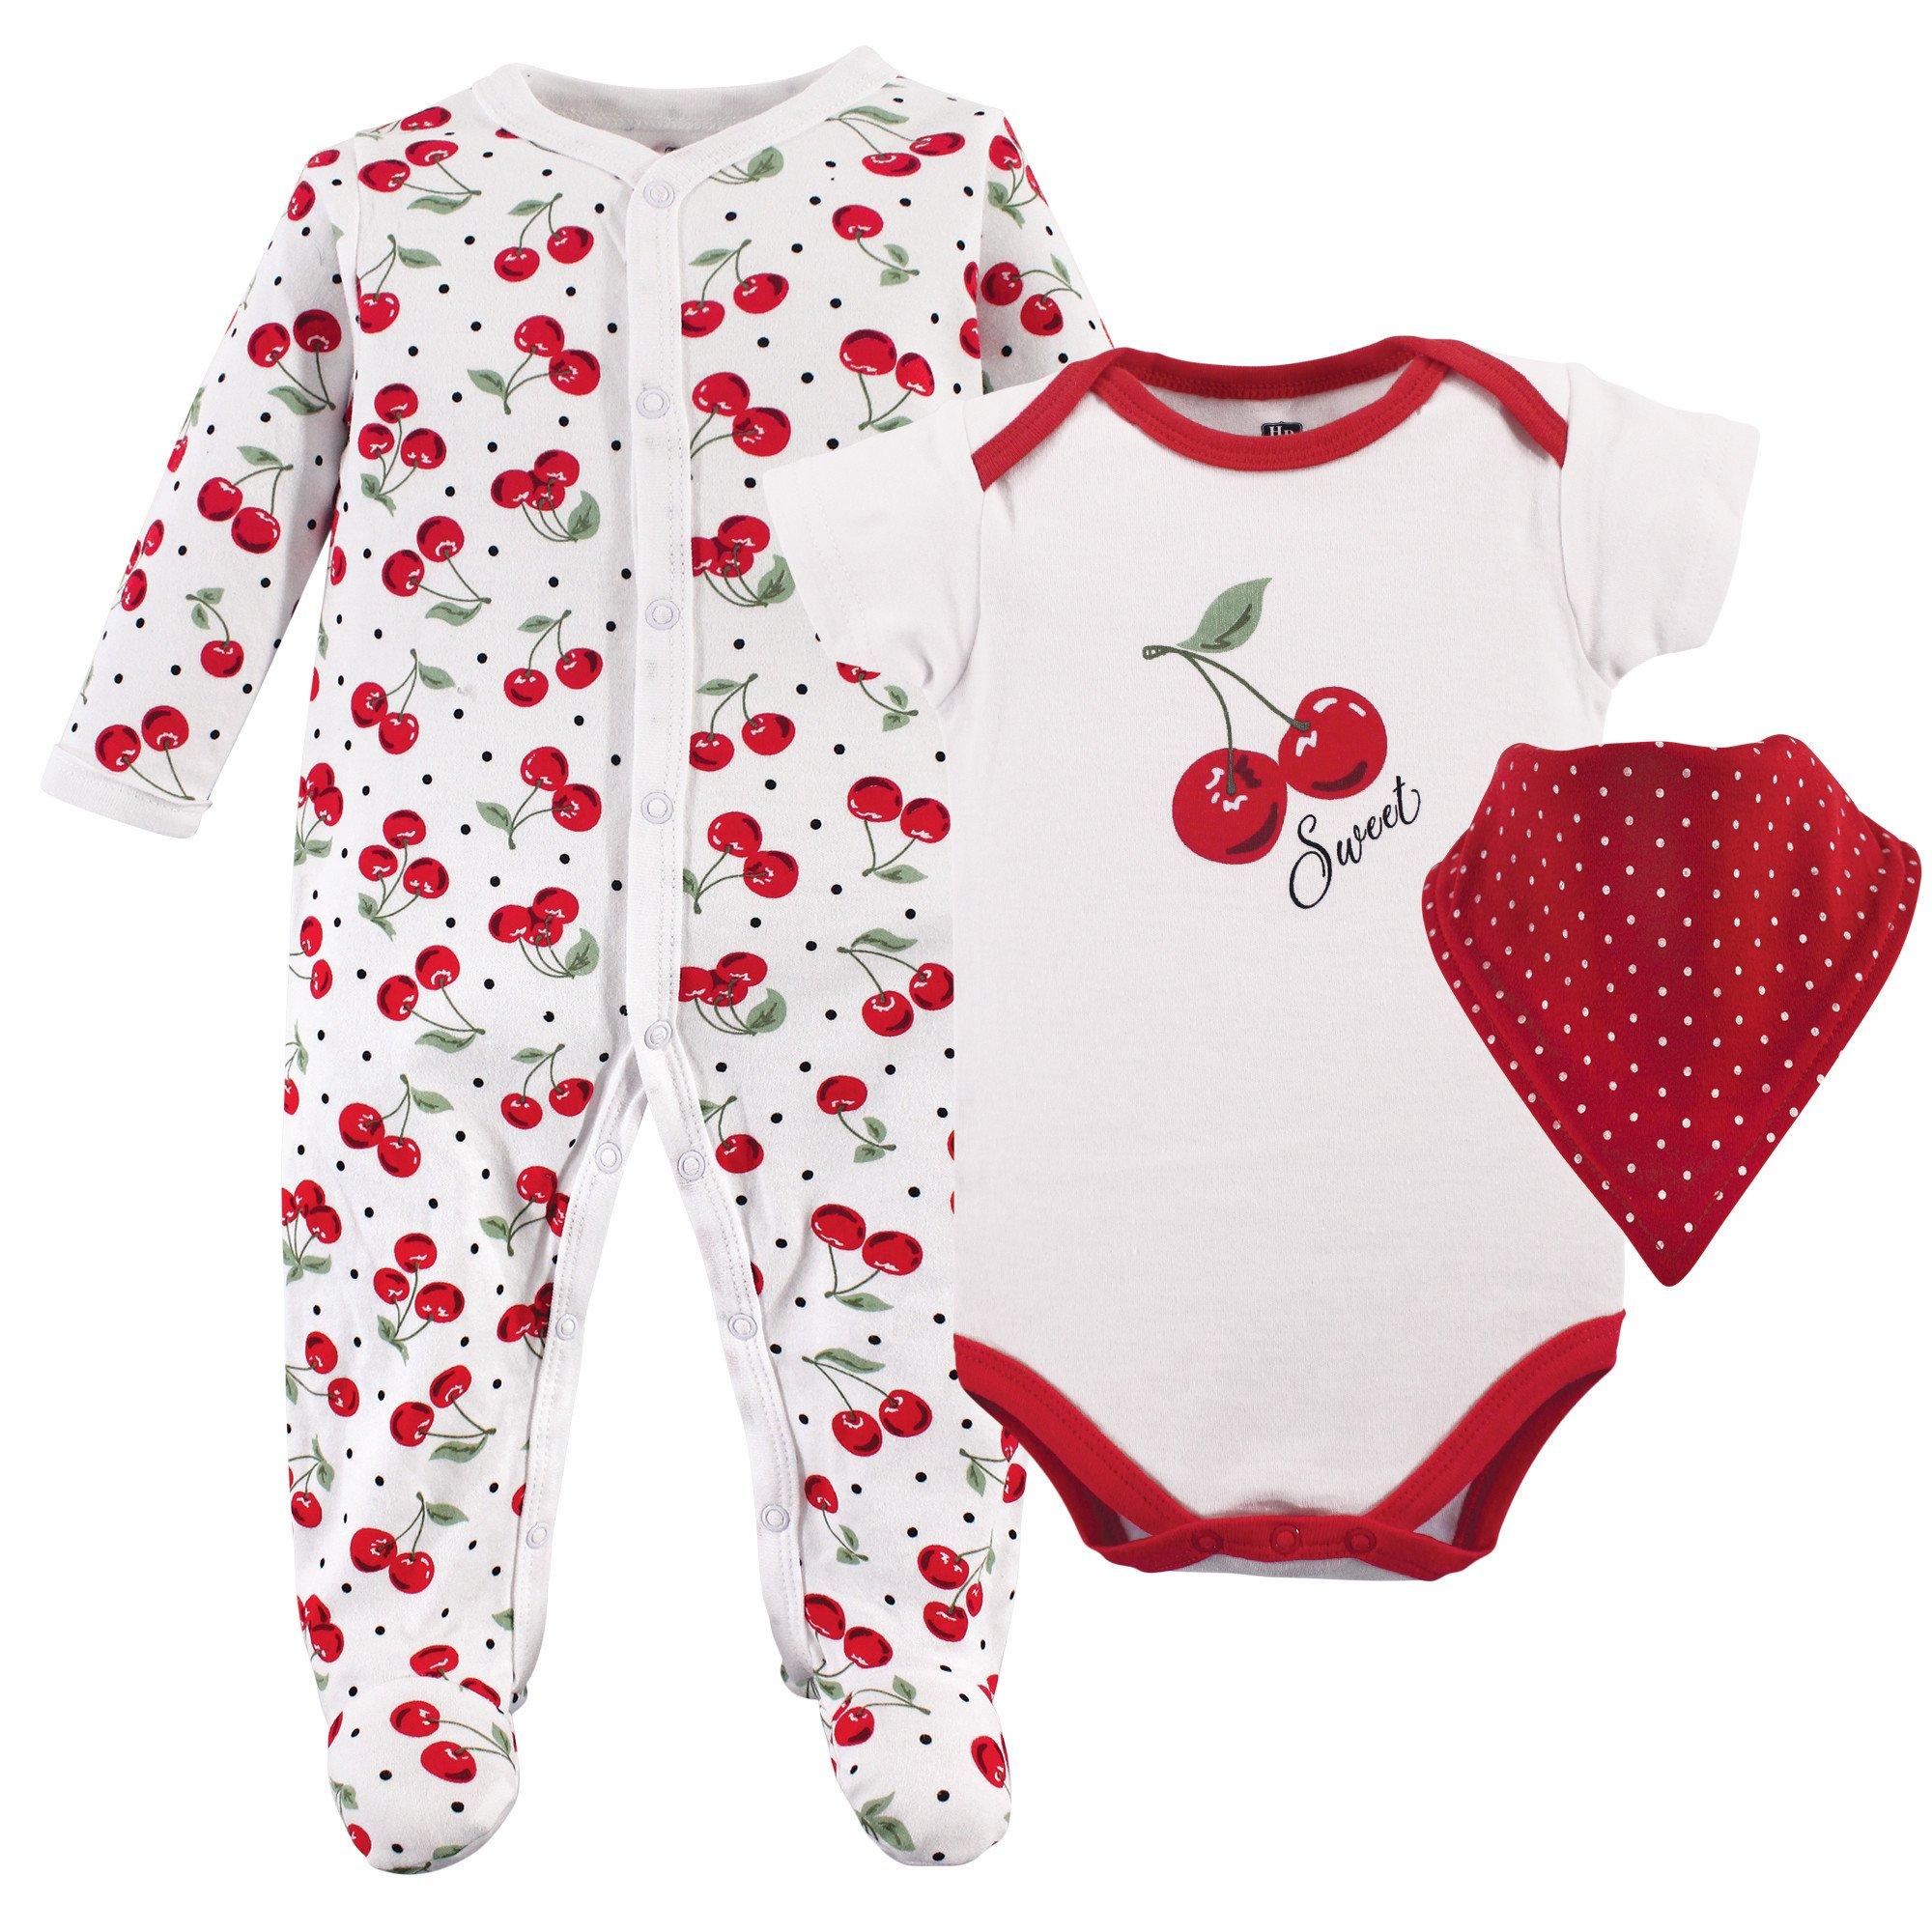 Hudson Baby Multi Piece Clothing Set, Cherries 3, 6-9 Months